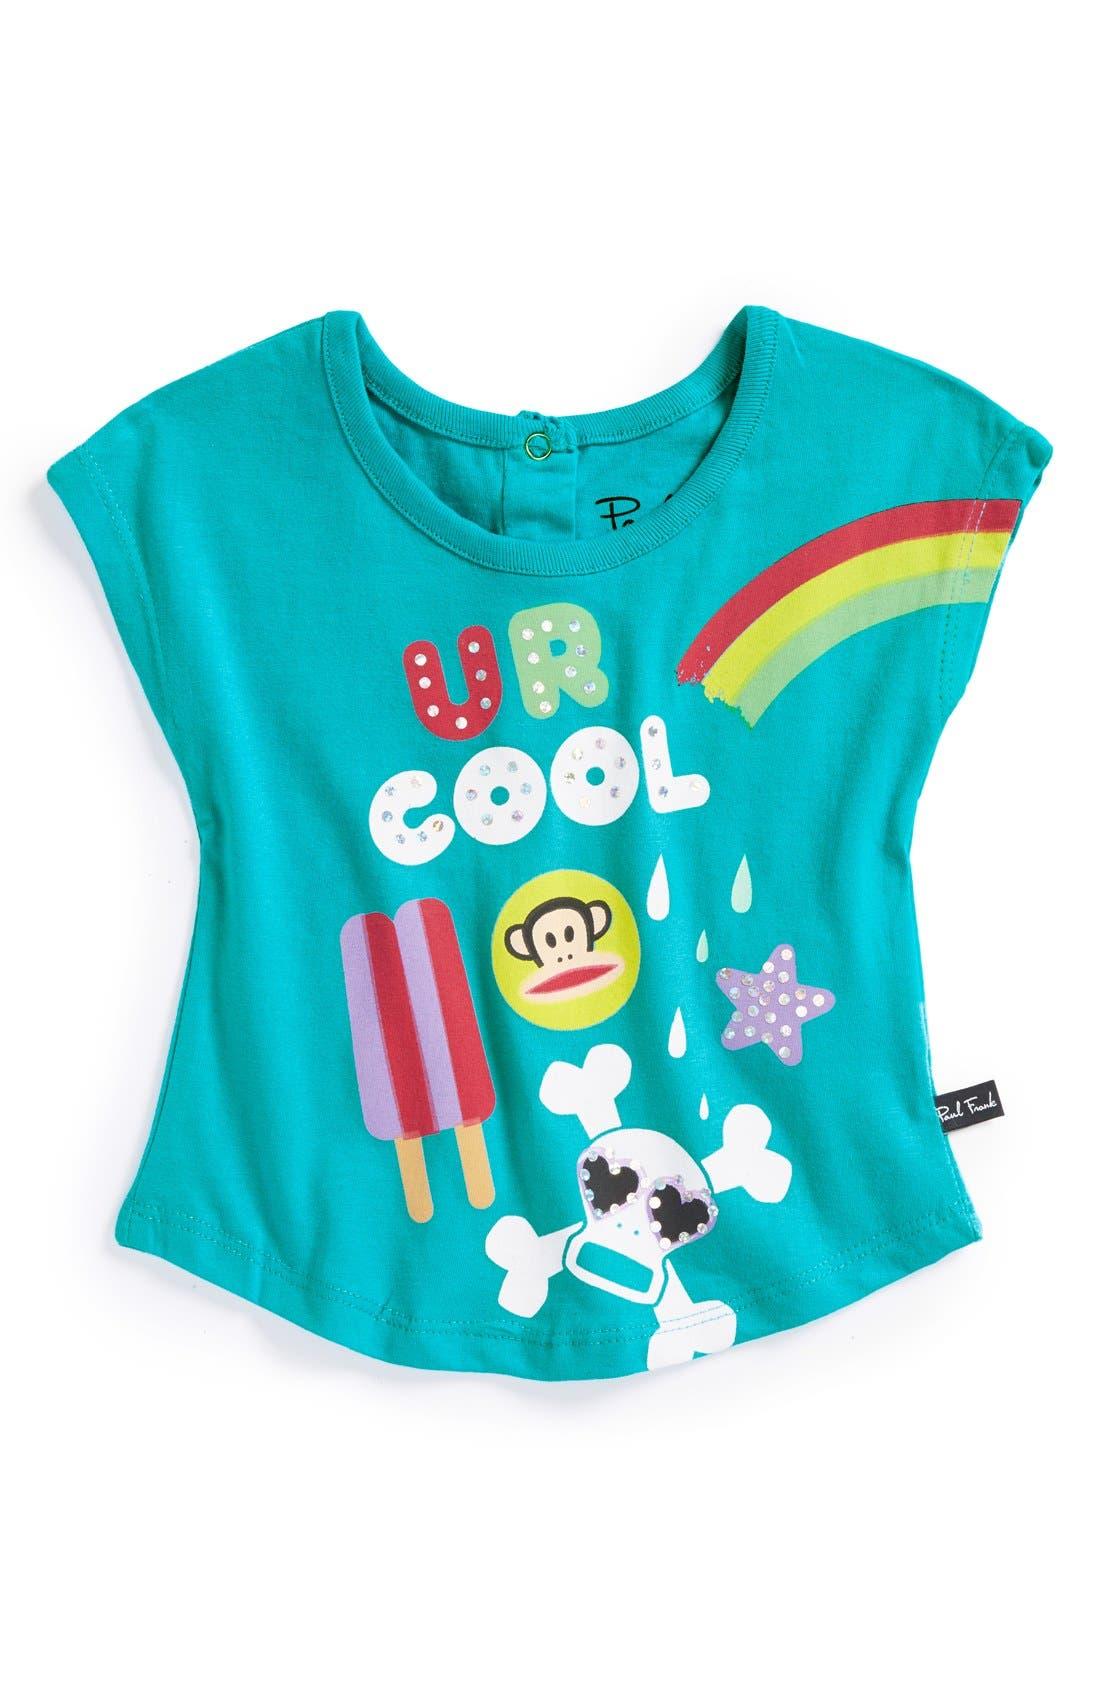 Main Image - Paul Frank 'U R Cool' Graphic Tee (Baby Girls)